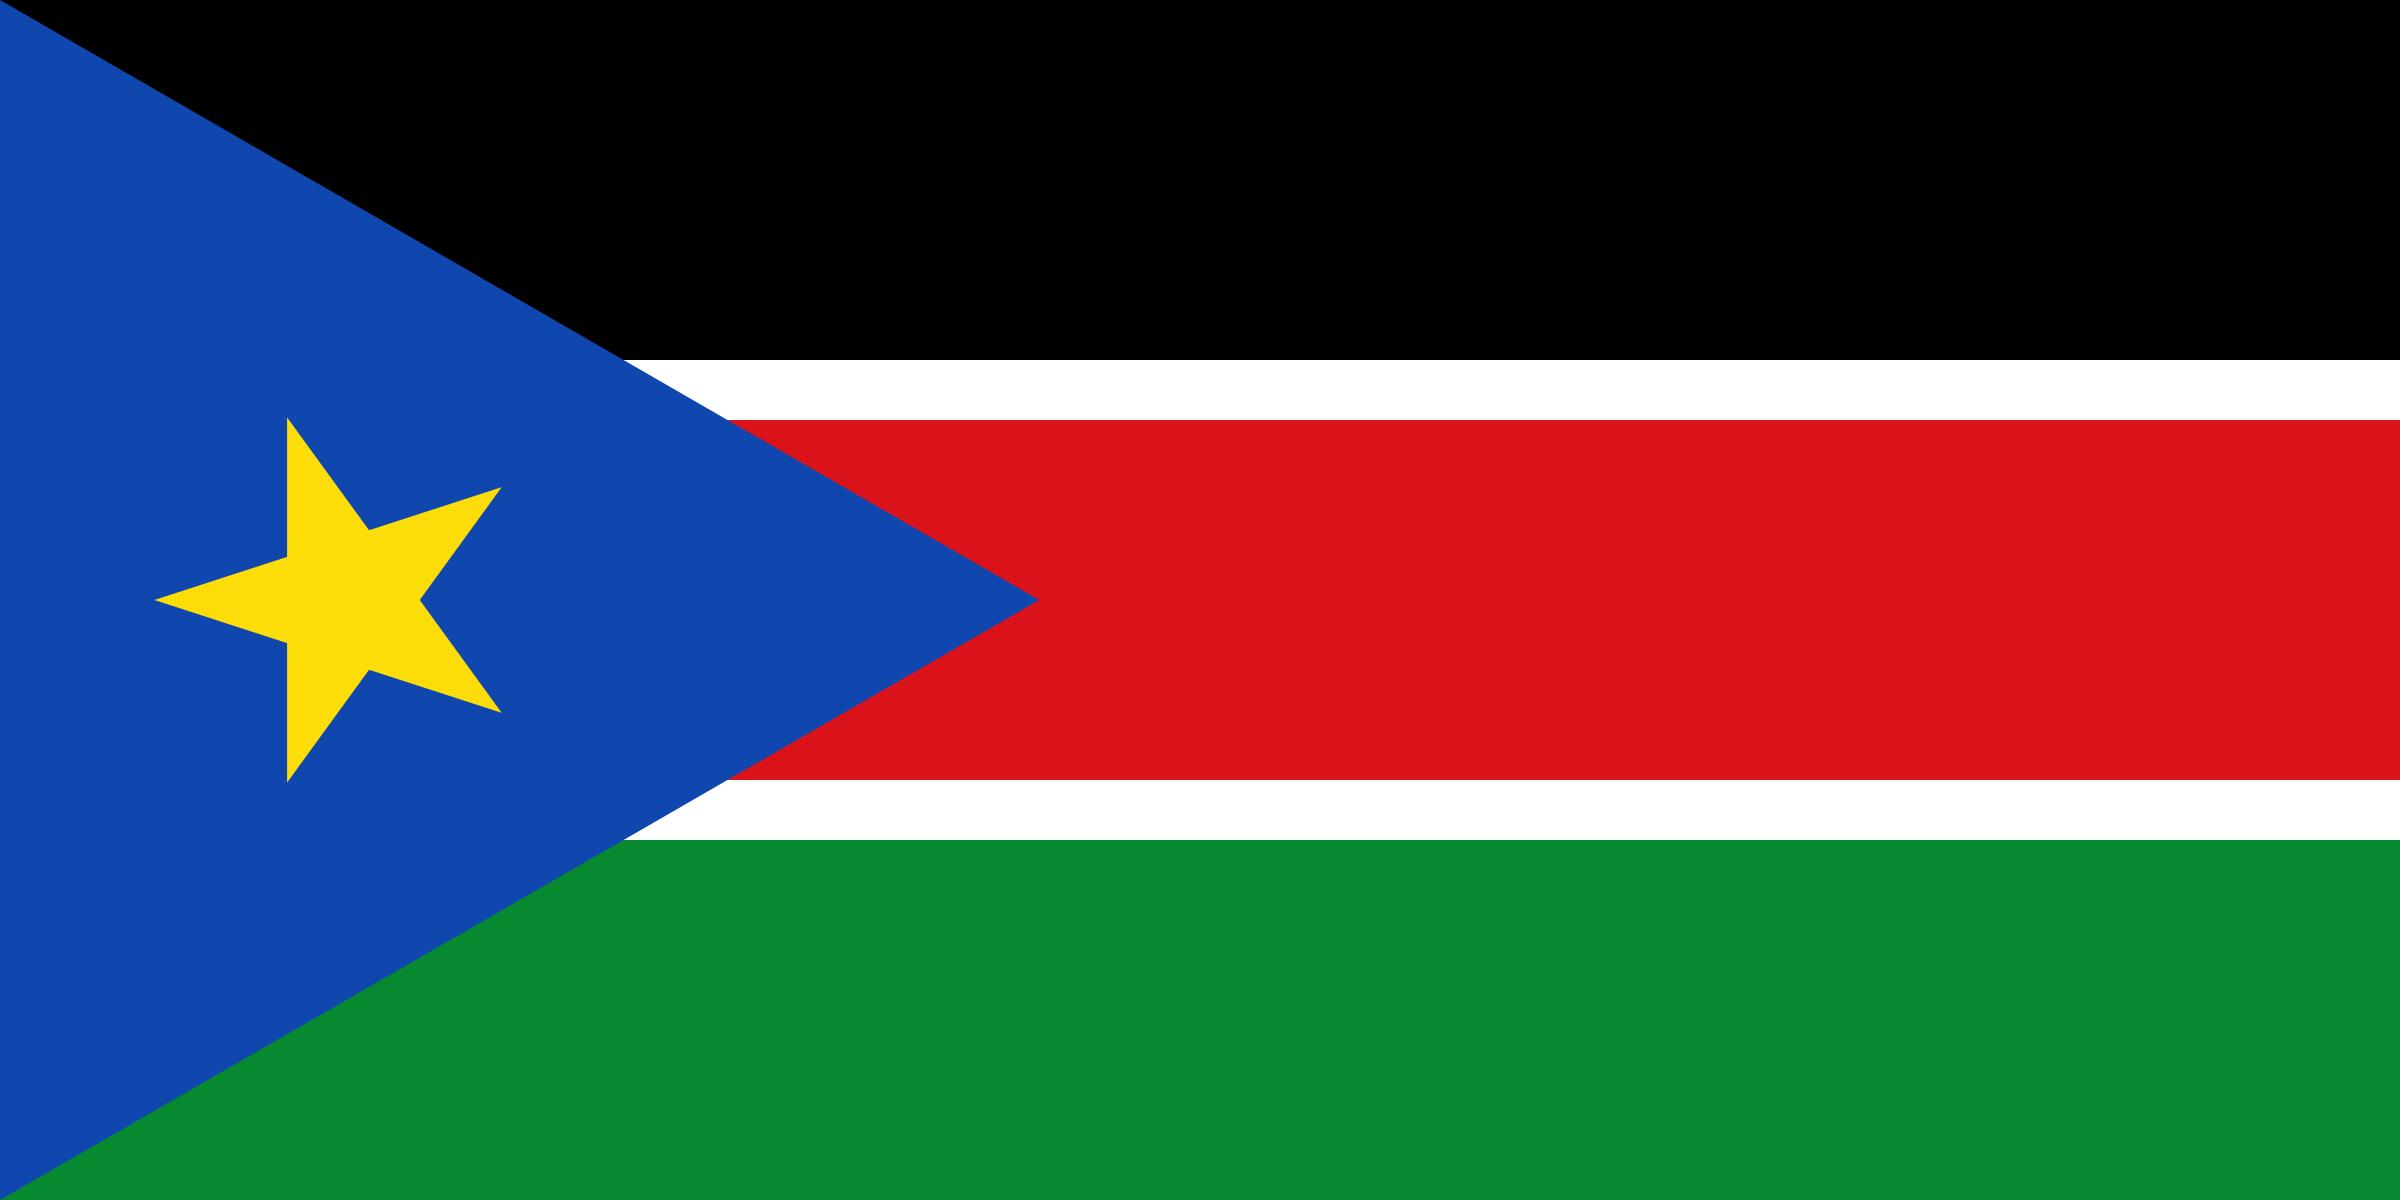 Clipart South Sudan Flag